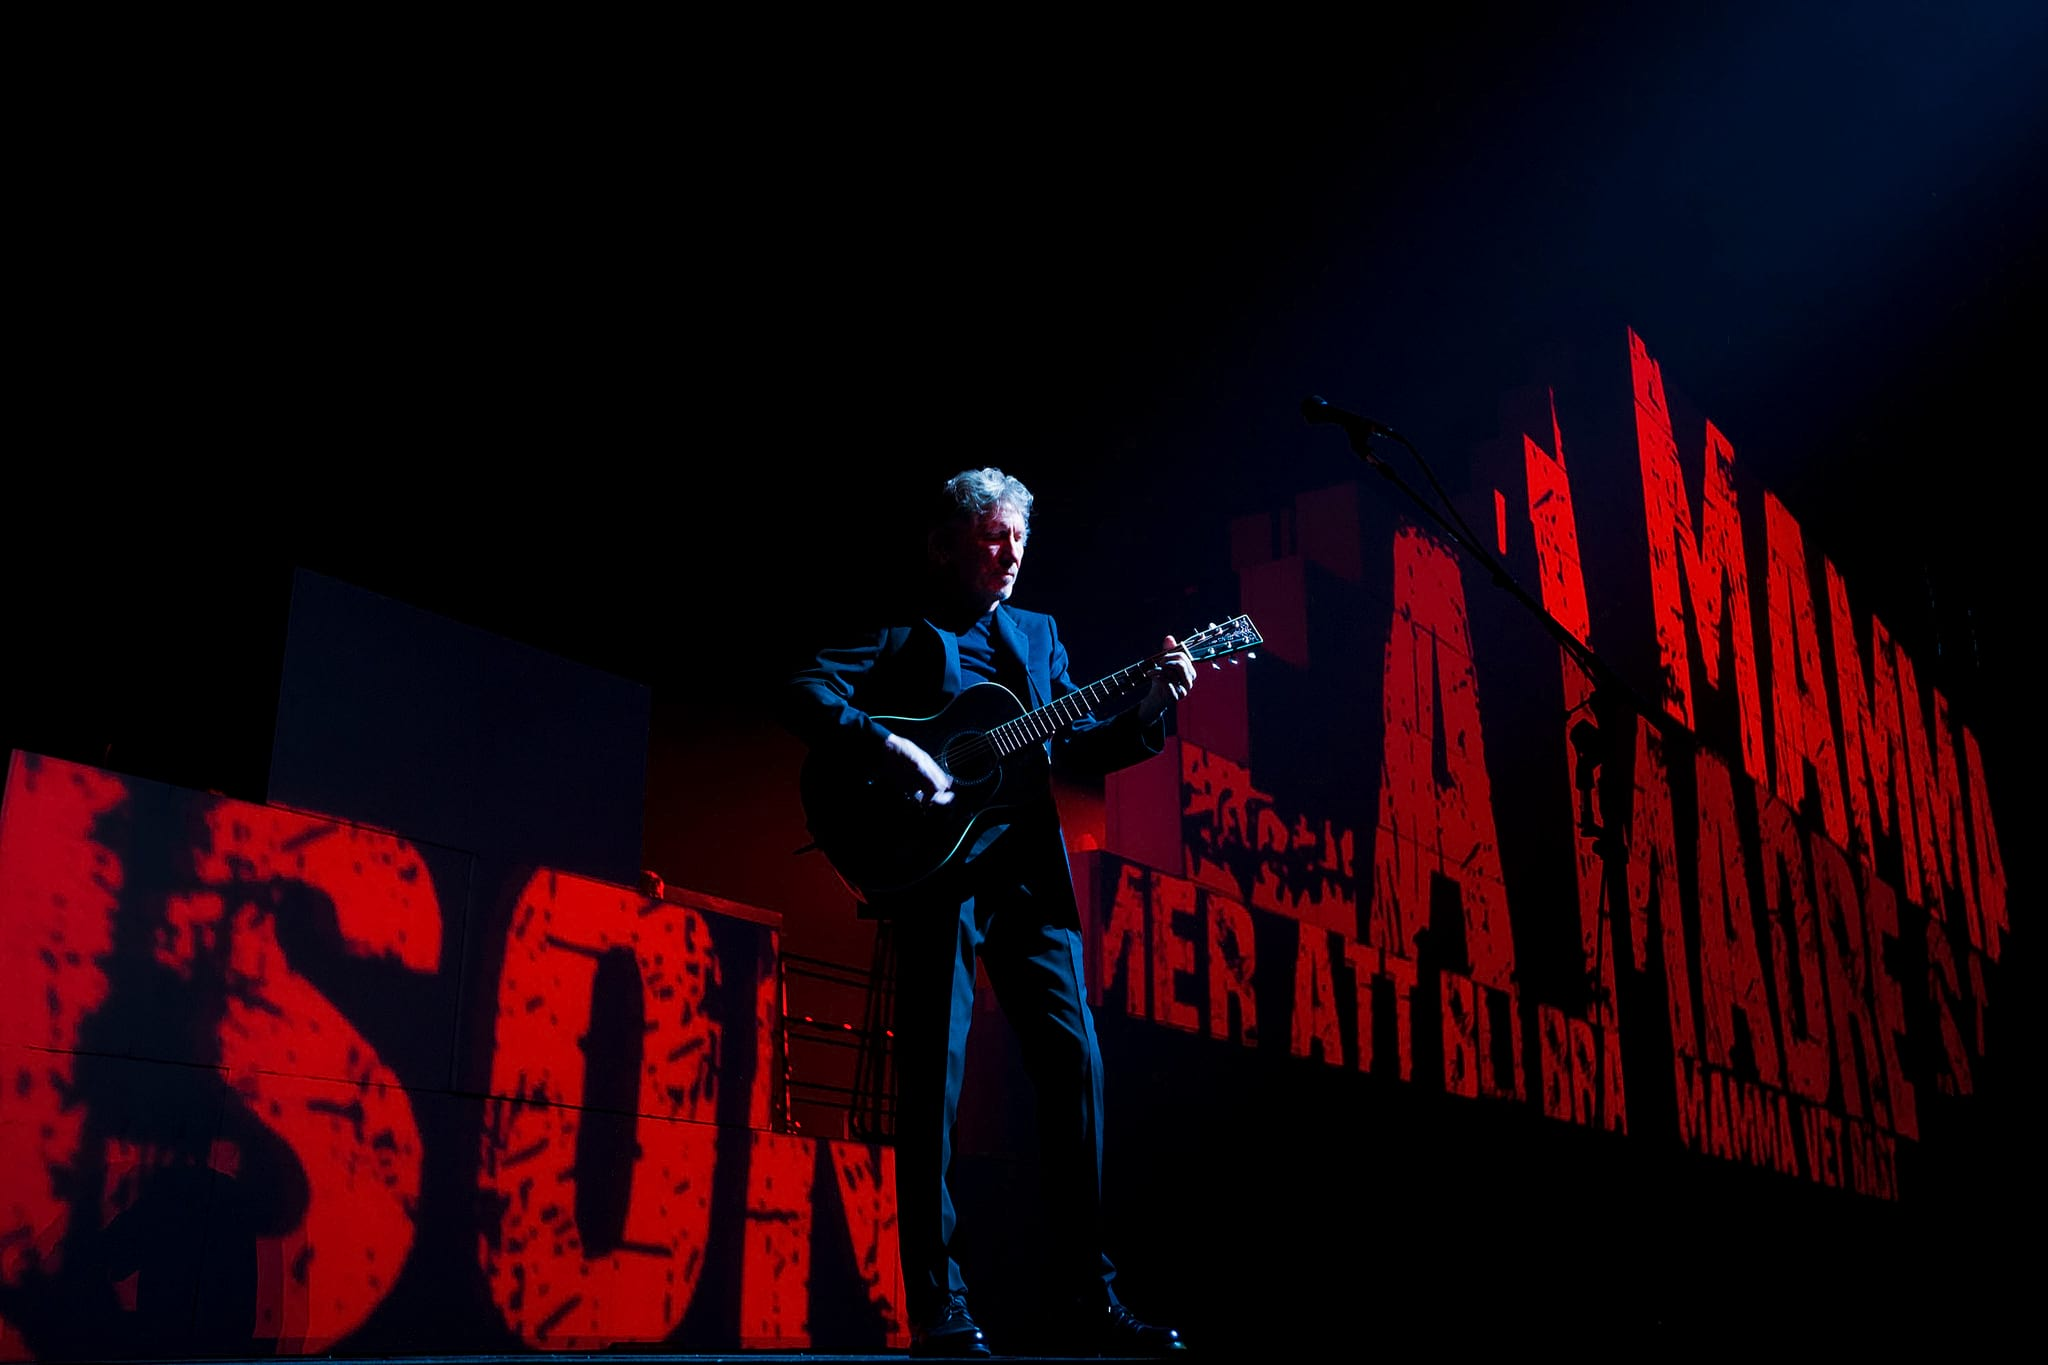 PÚBLICO - Roger Waters regressa a Portugal no Verão de 2018